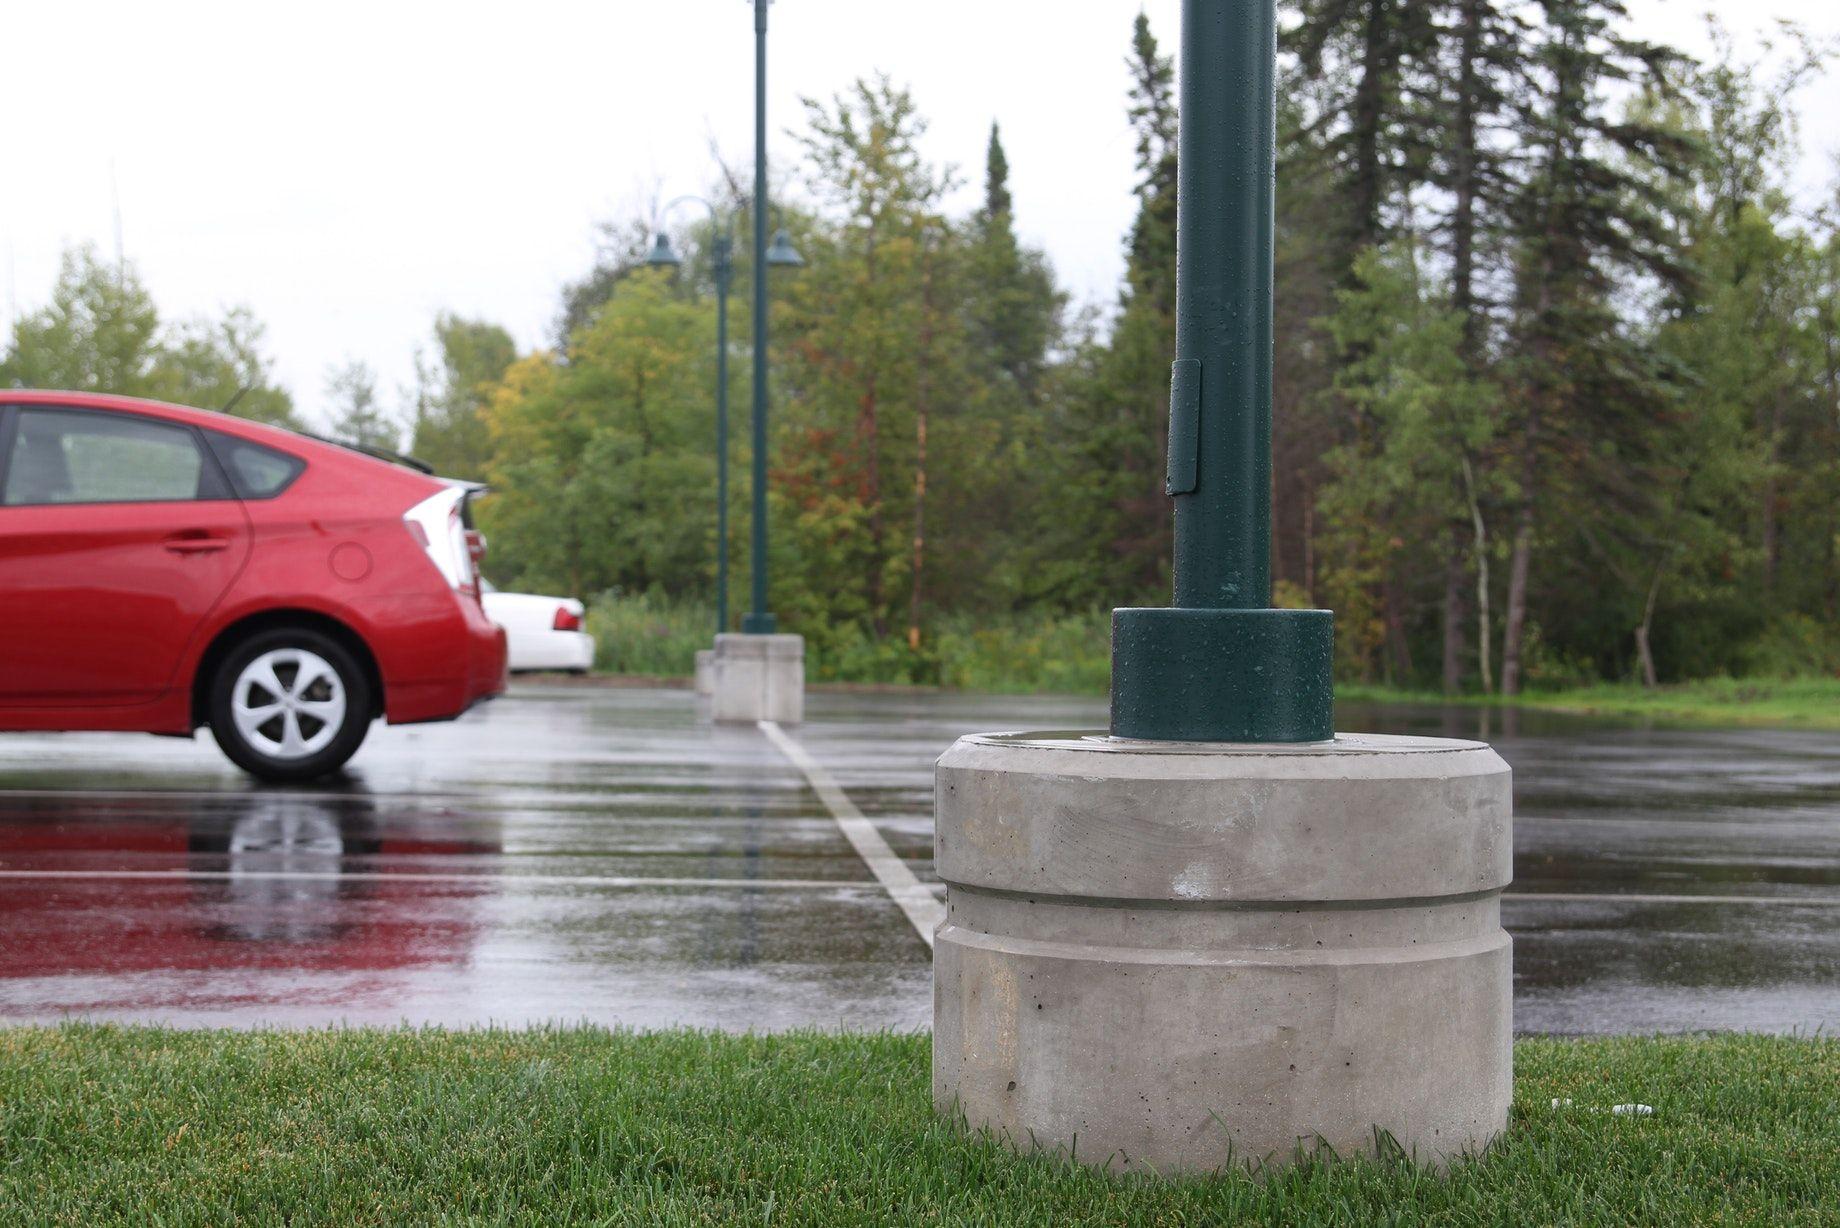 Benefits of installing precast light pole bases vs. sonotube